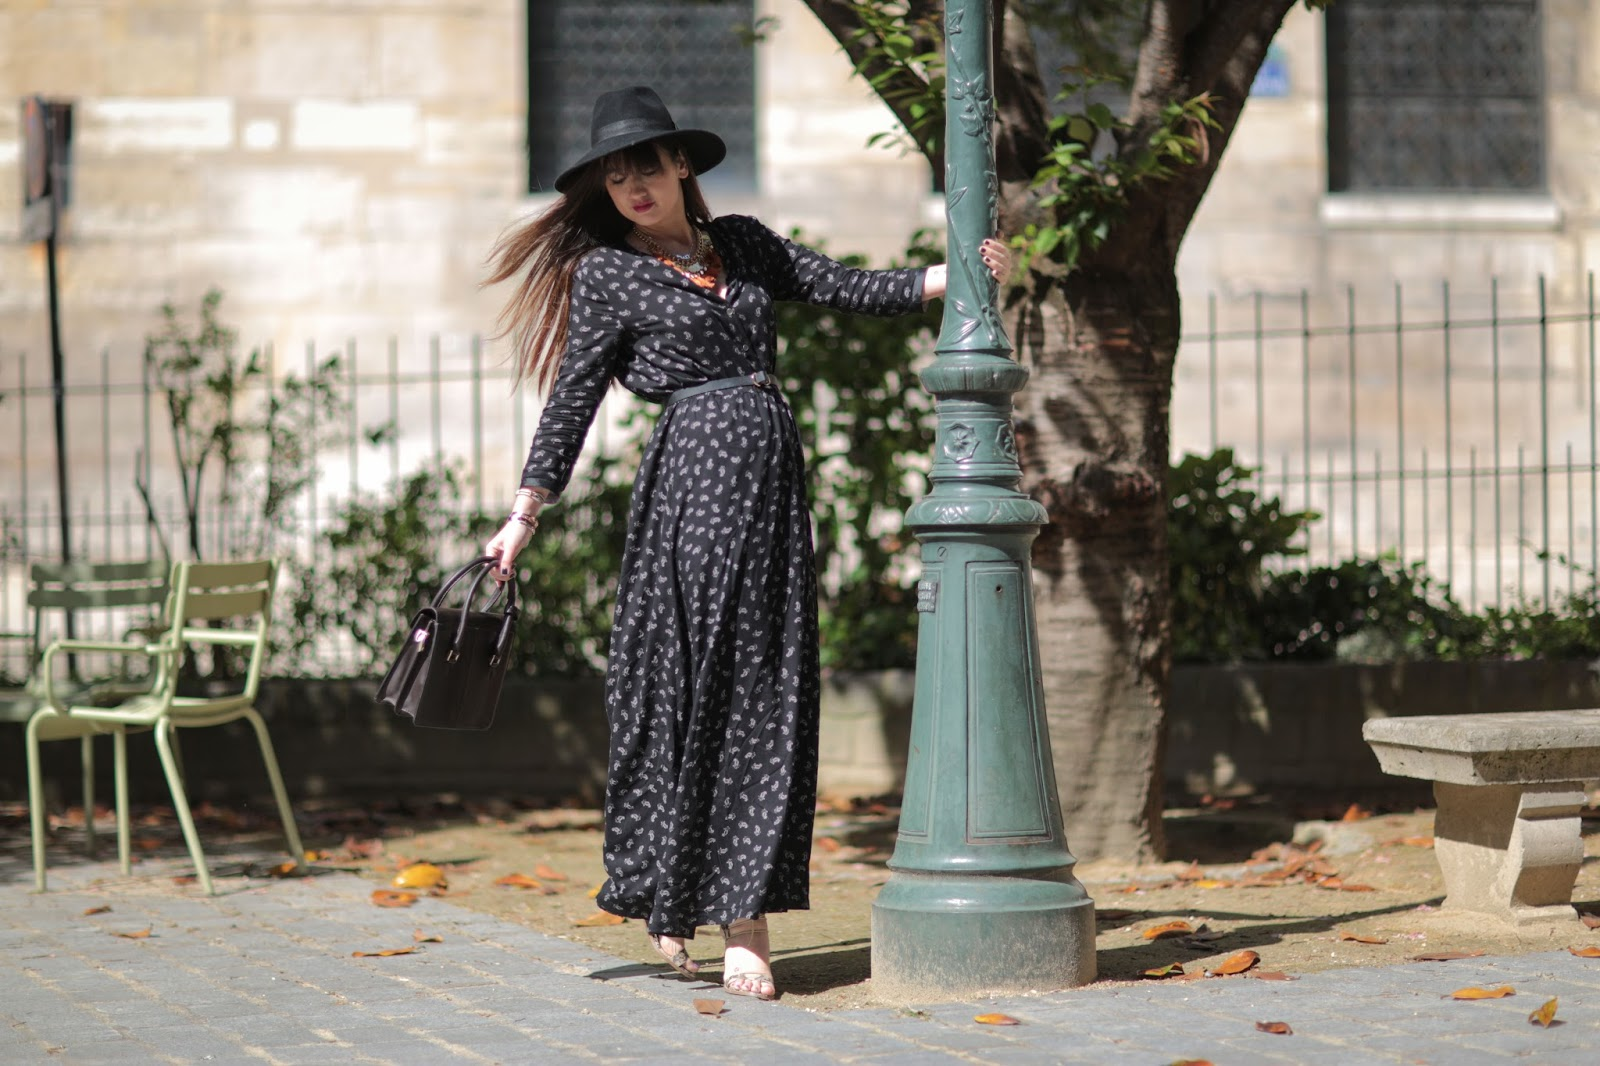 meetmeinparee, blogger, fashion, look, style, lookbook, chic parisian style, paris, sisley